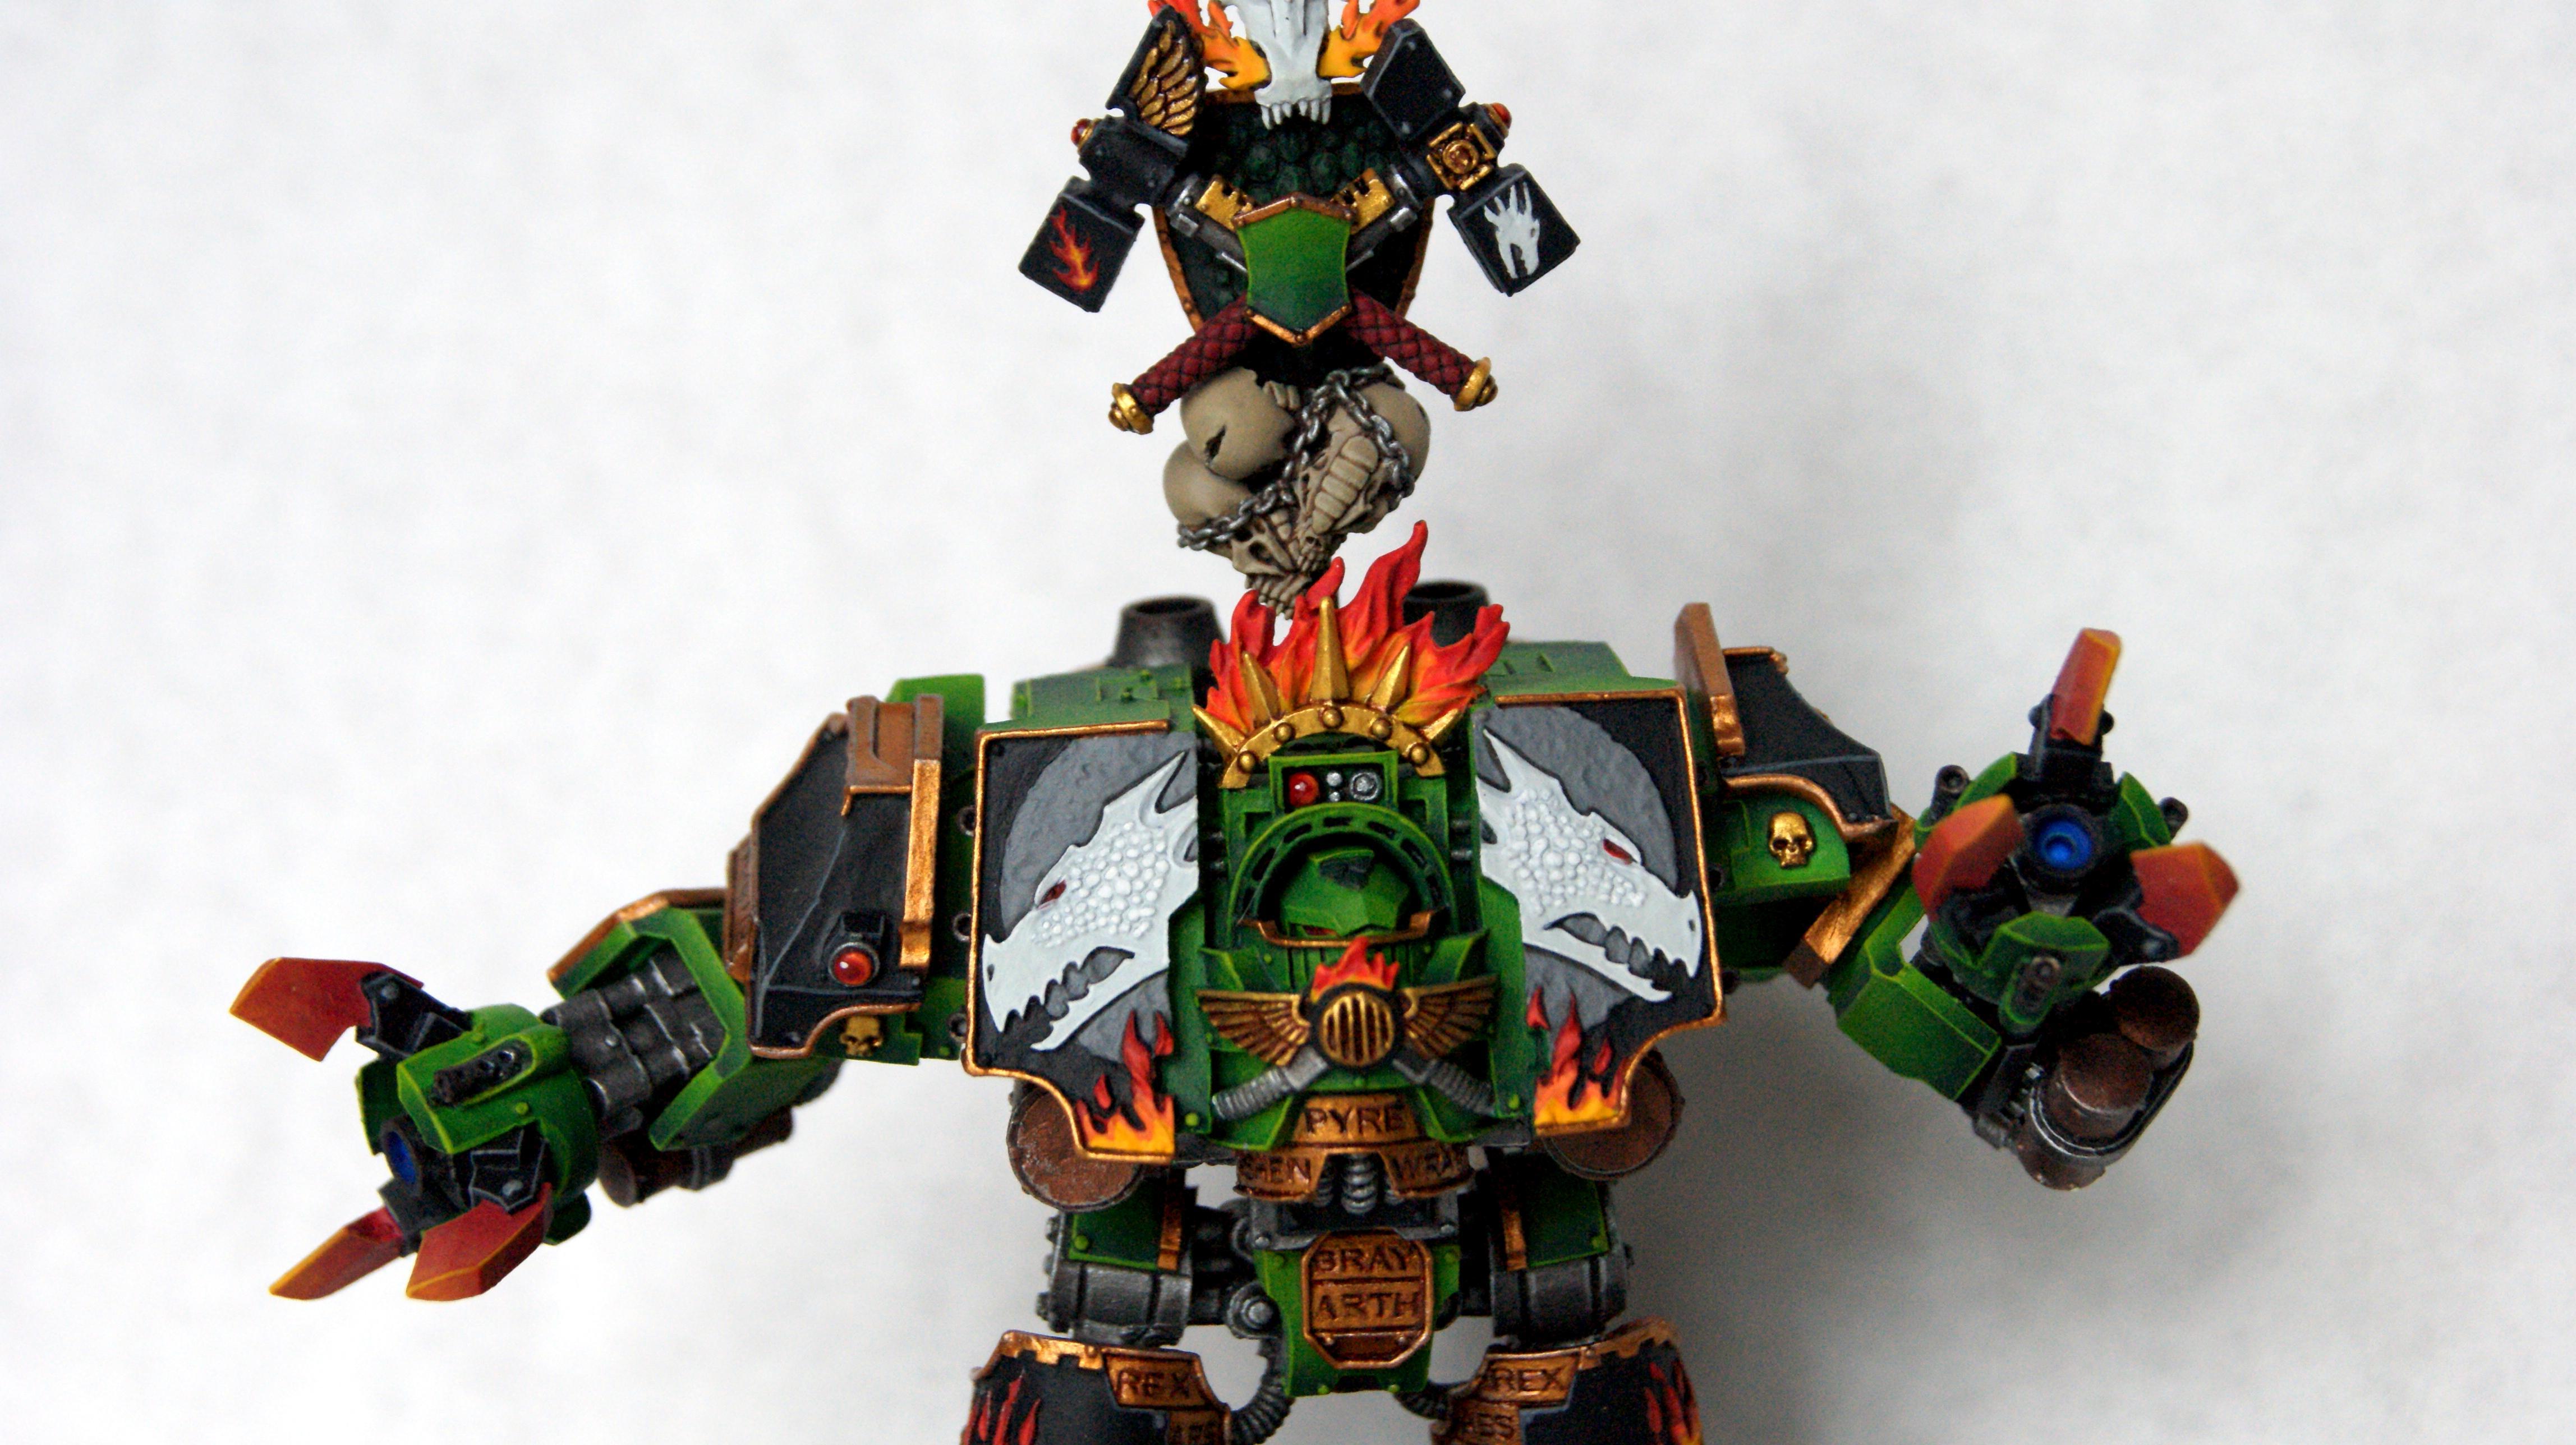 Bray'arth Ashmantle, Dreadnought, Forge World, Green, Salamanders, Space Marines, Warhammer 40,000